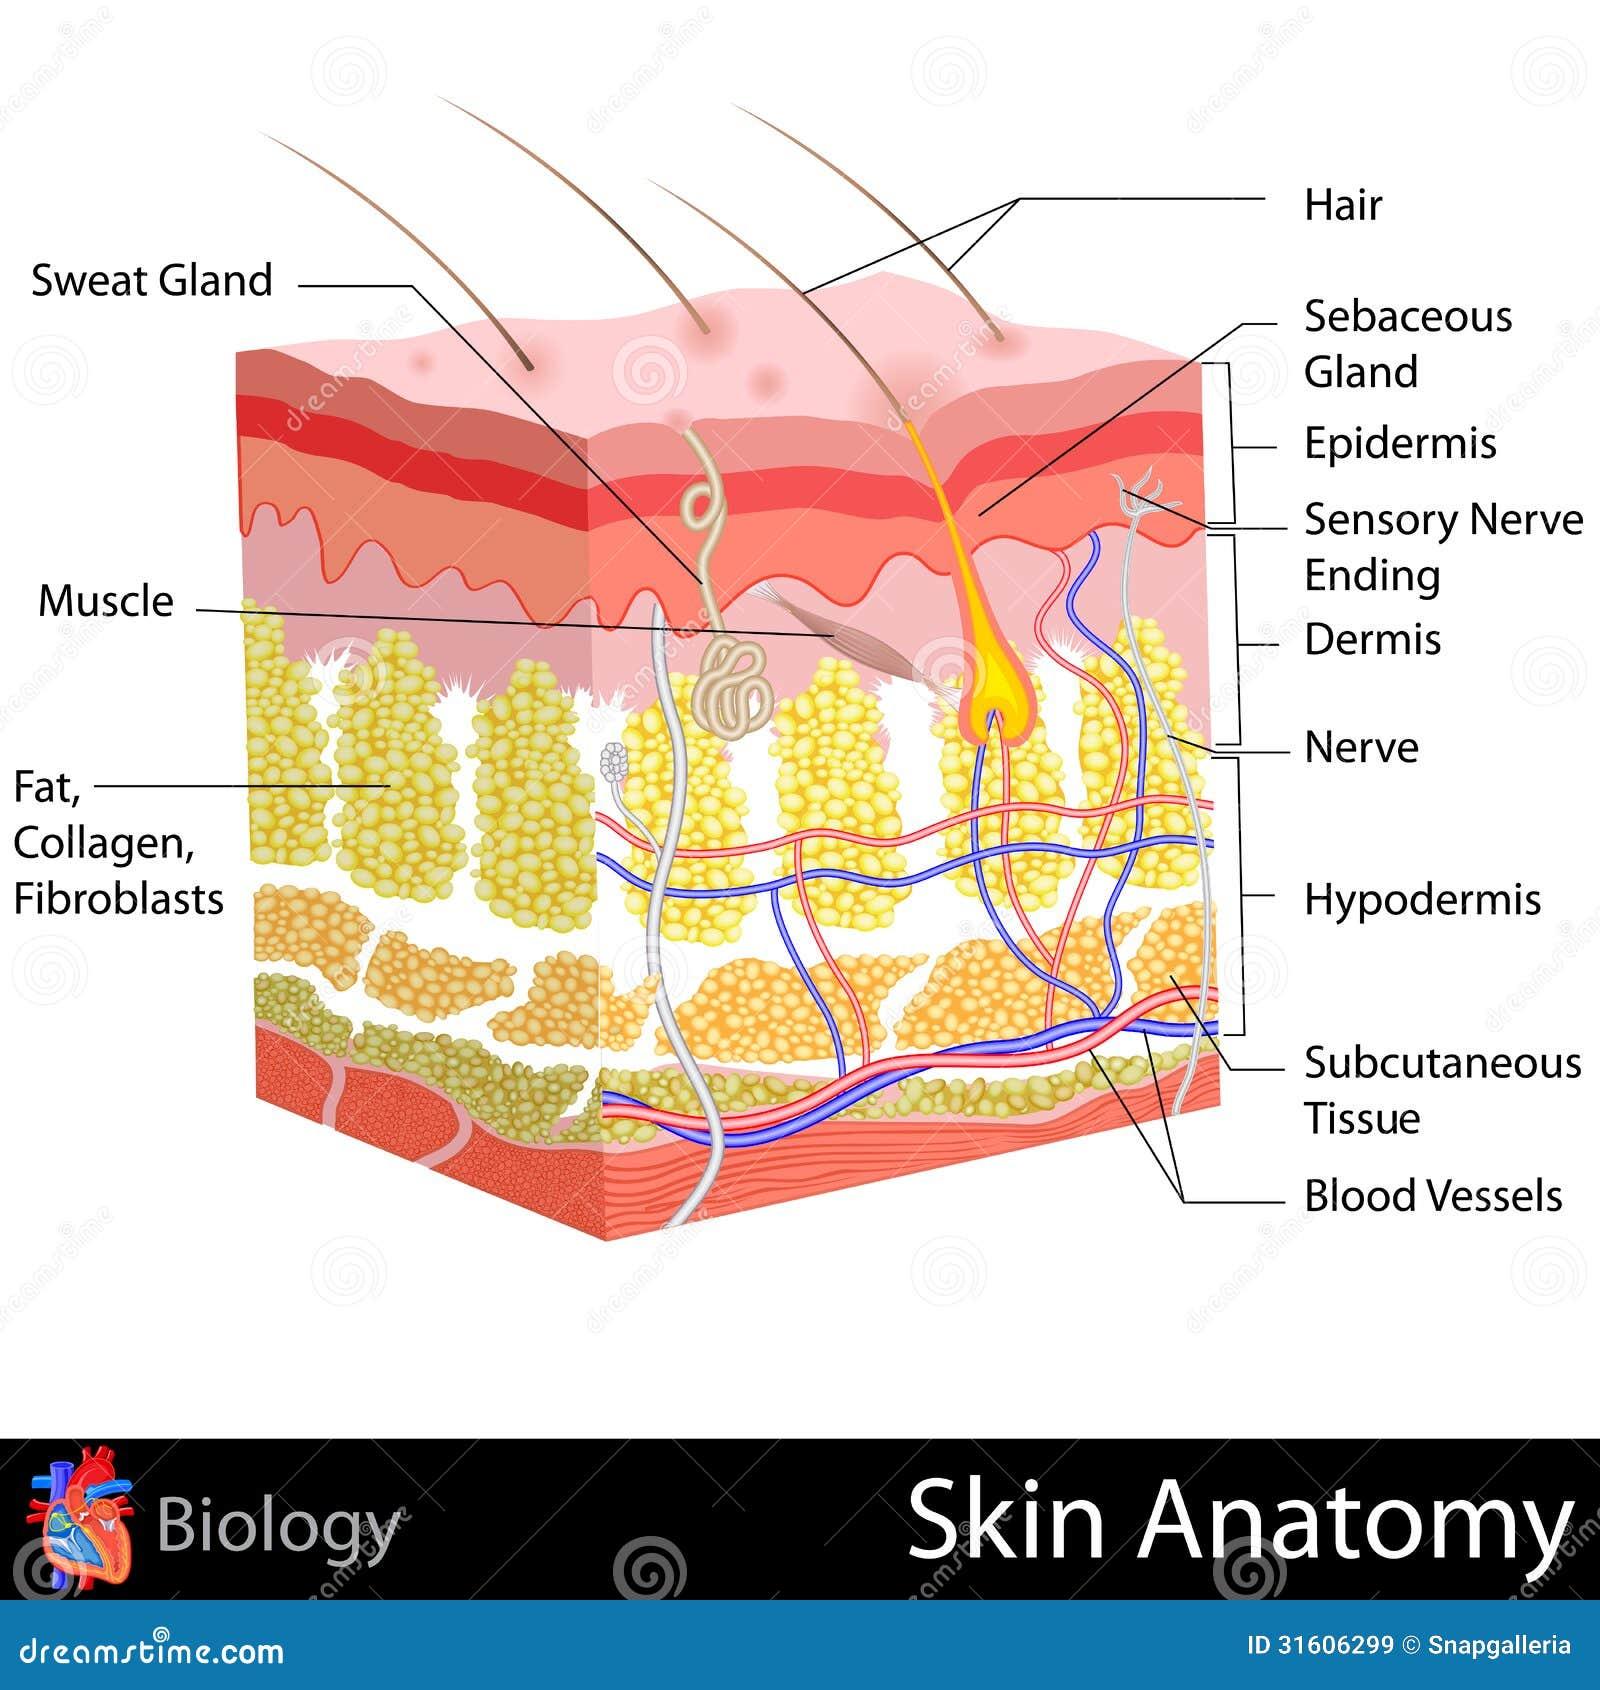 Skin Anatomy Royalty Free Stock Images - Image: 31606299